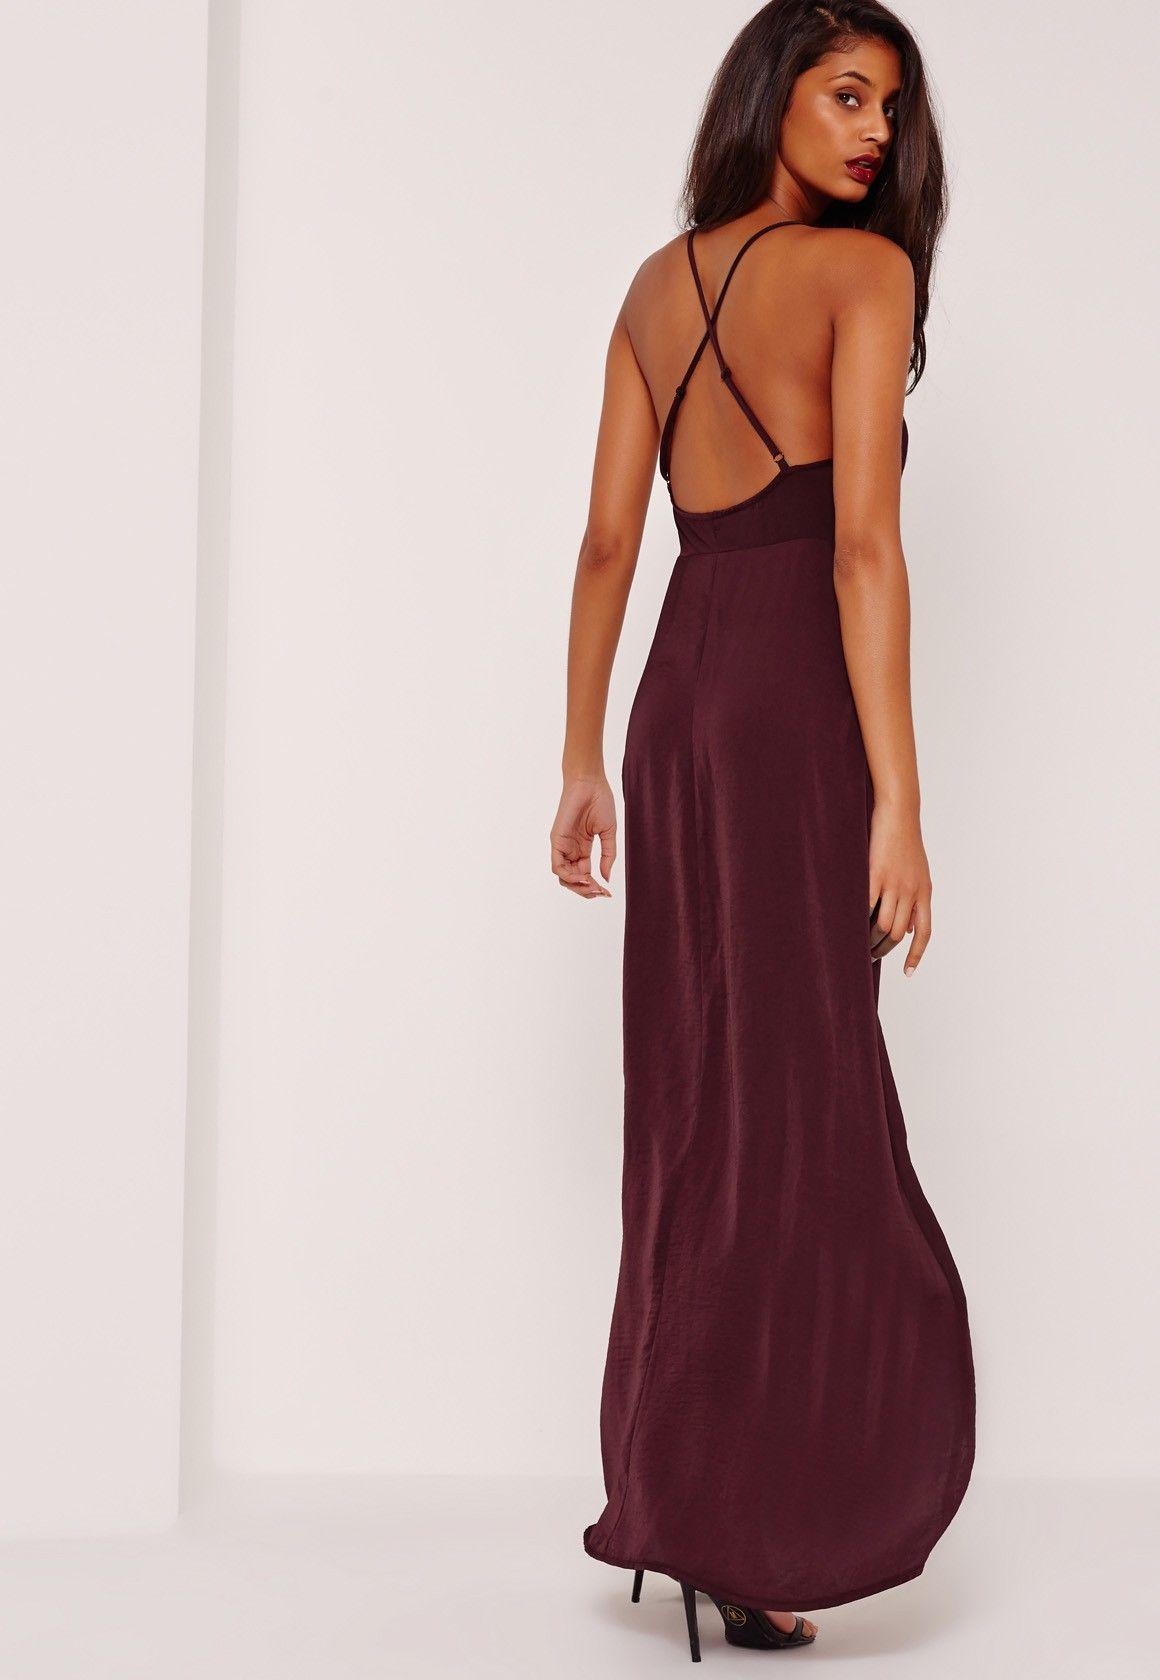 Missguided Sarah Ashcroft Silky Strappy Maxi Dress Purple [ 1680 x 1160 Pixel ]